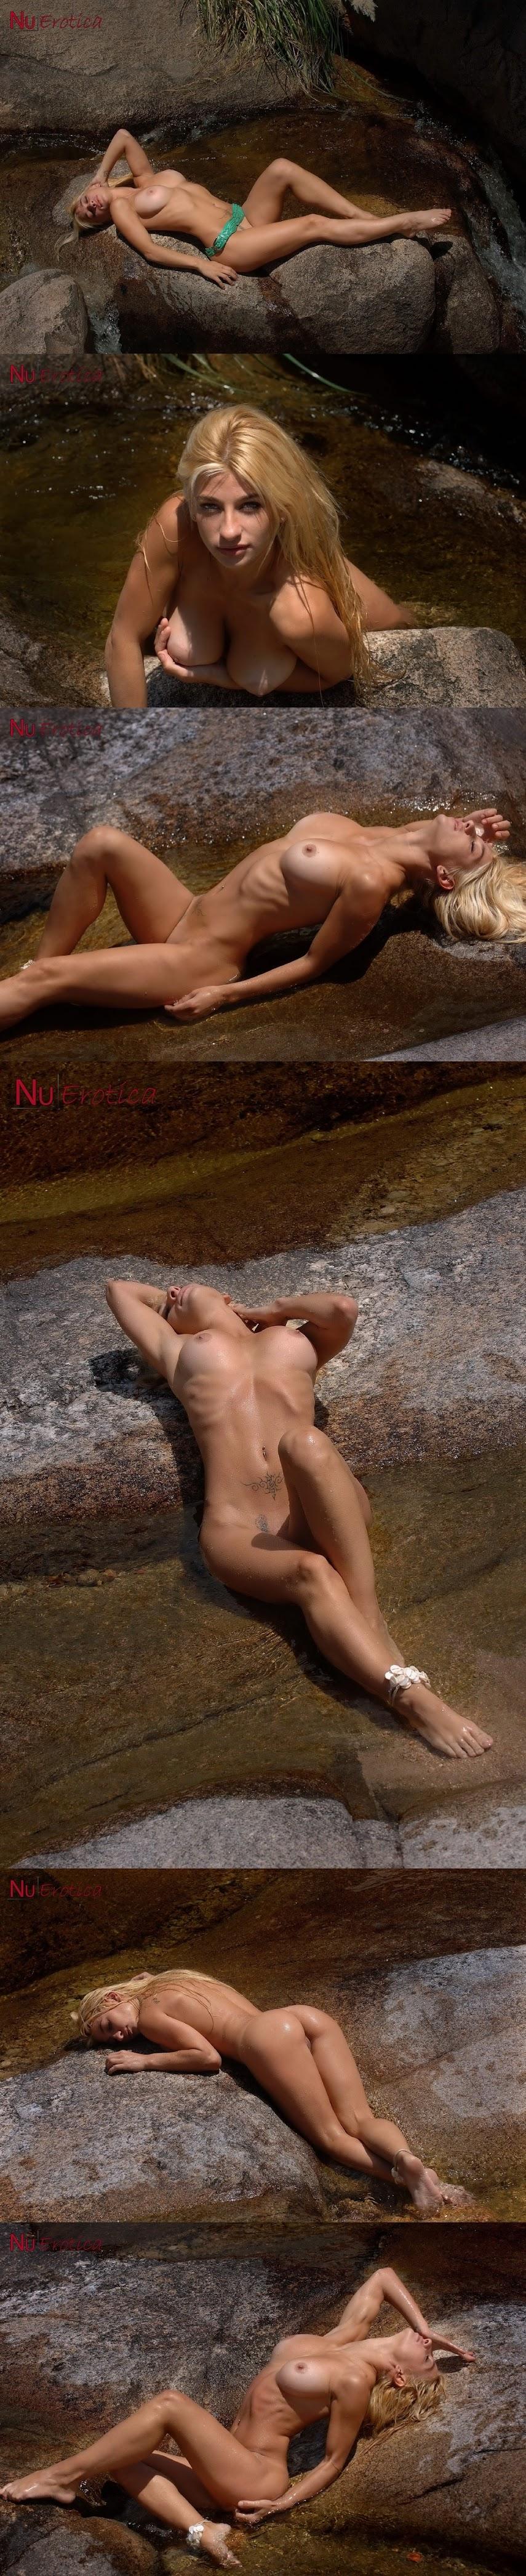 NuErotica 2015-10-28 Aldana Golden - Aldana Perfect Ass On Rocks